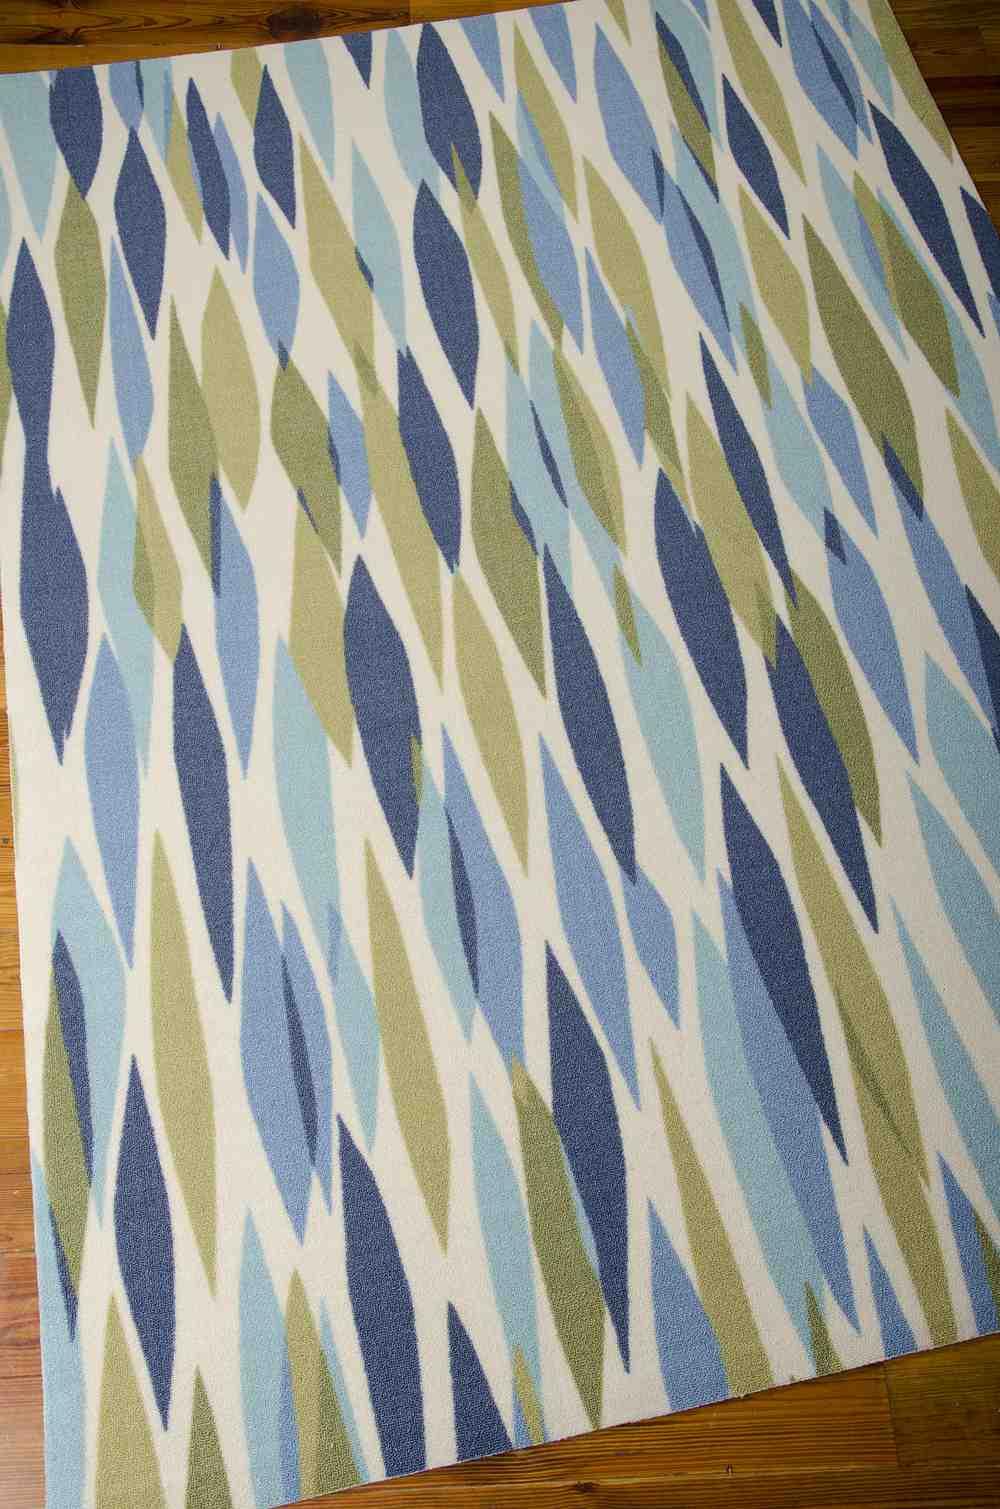 Nourison Waverly Sun And Shade Snd01 Seaglass Area Rug